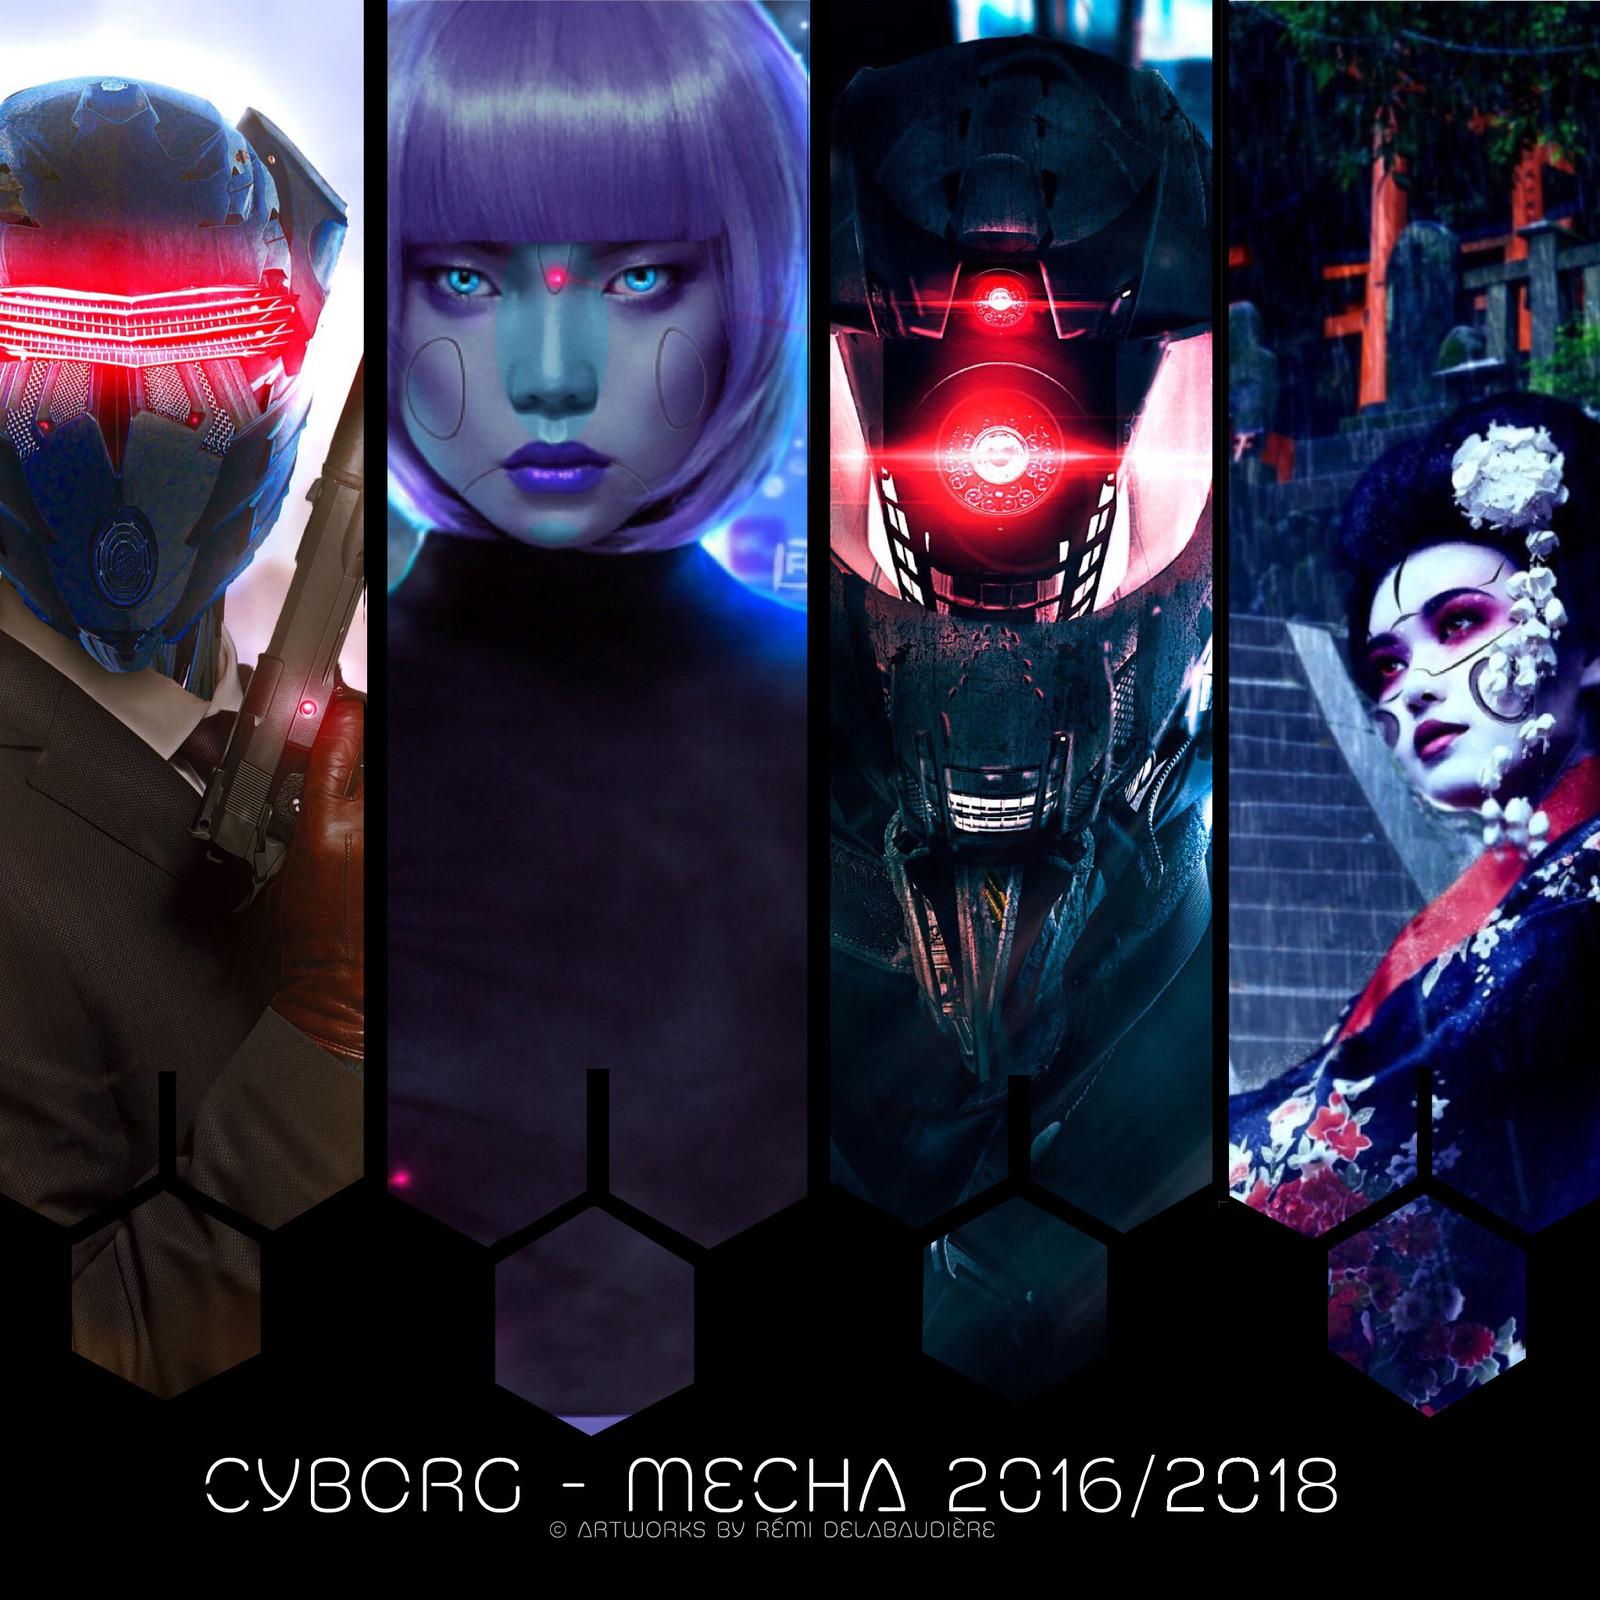 Cyborg - Mecha 2016/2018